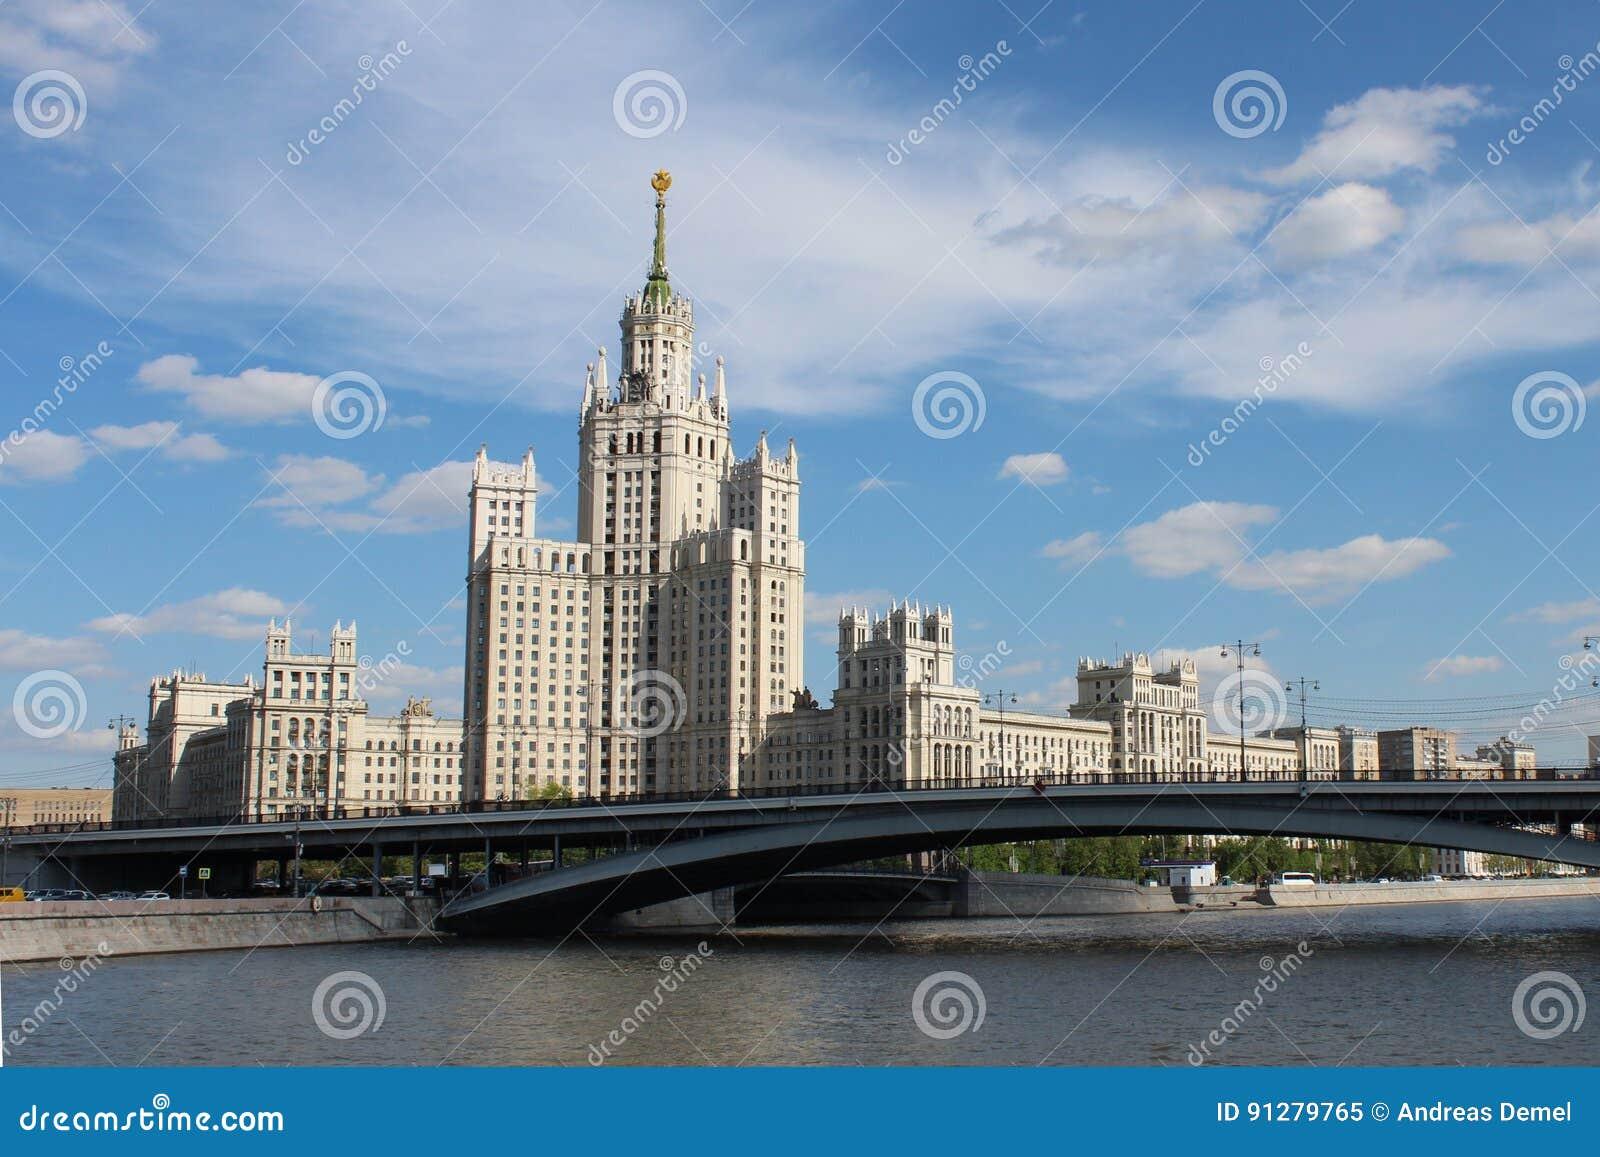 Kotelnicheskaya Embankment Building in moscow, russia